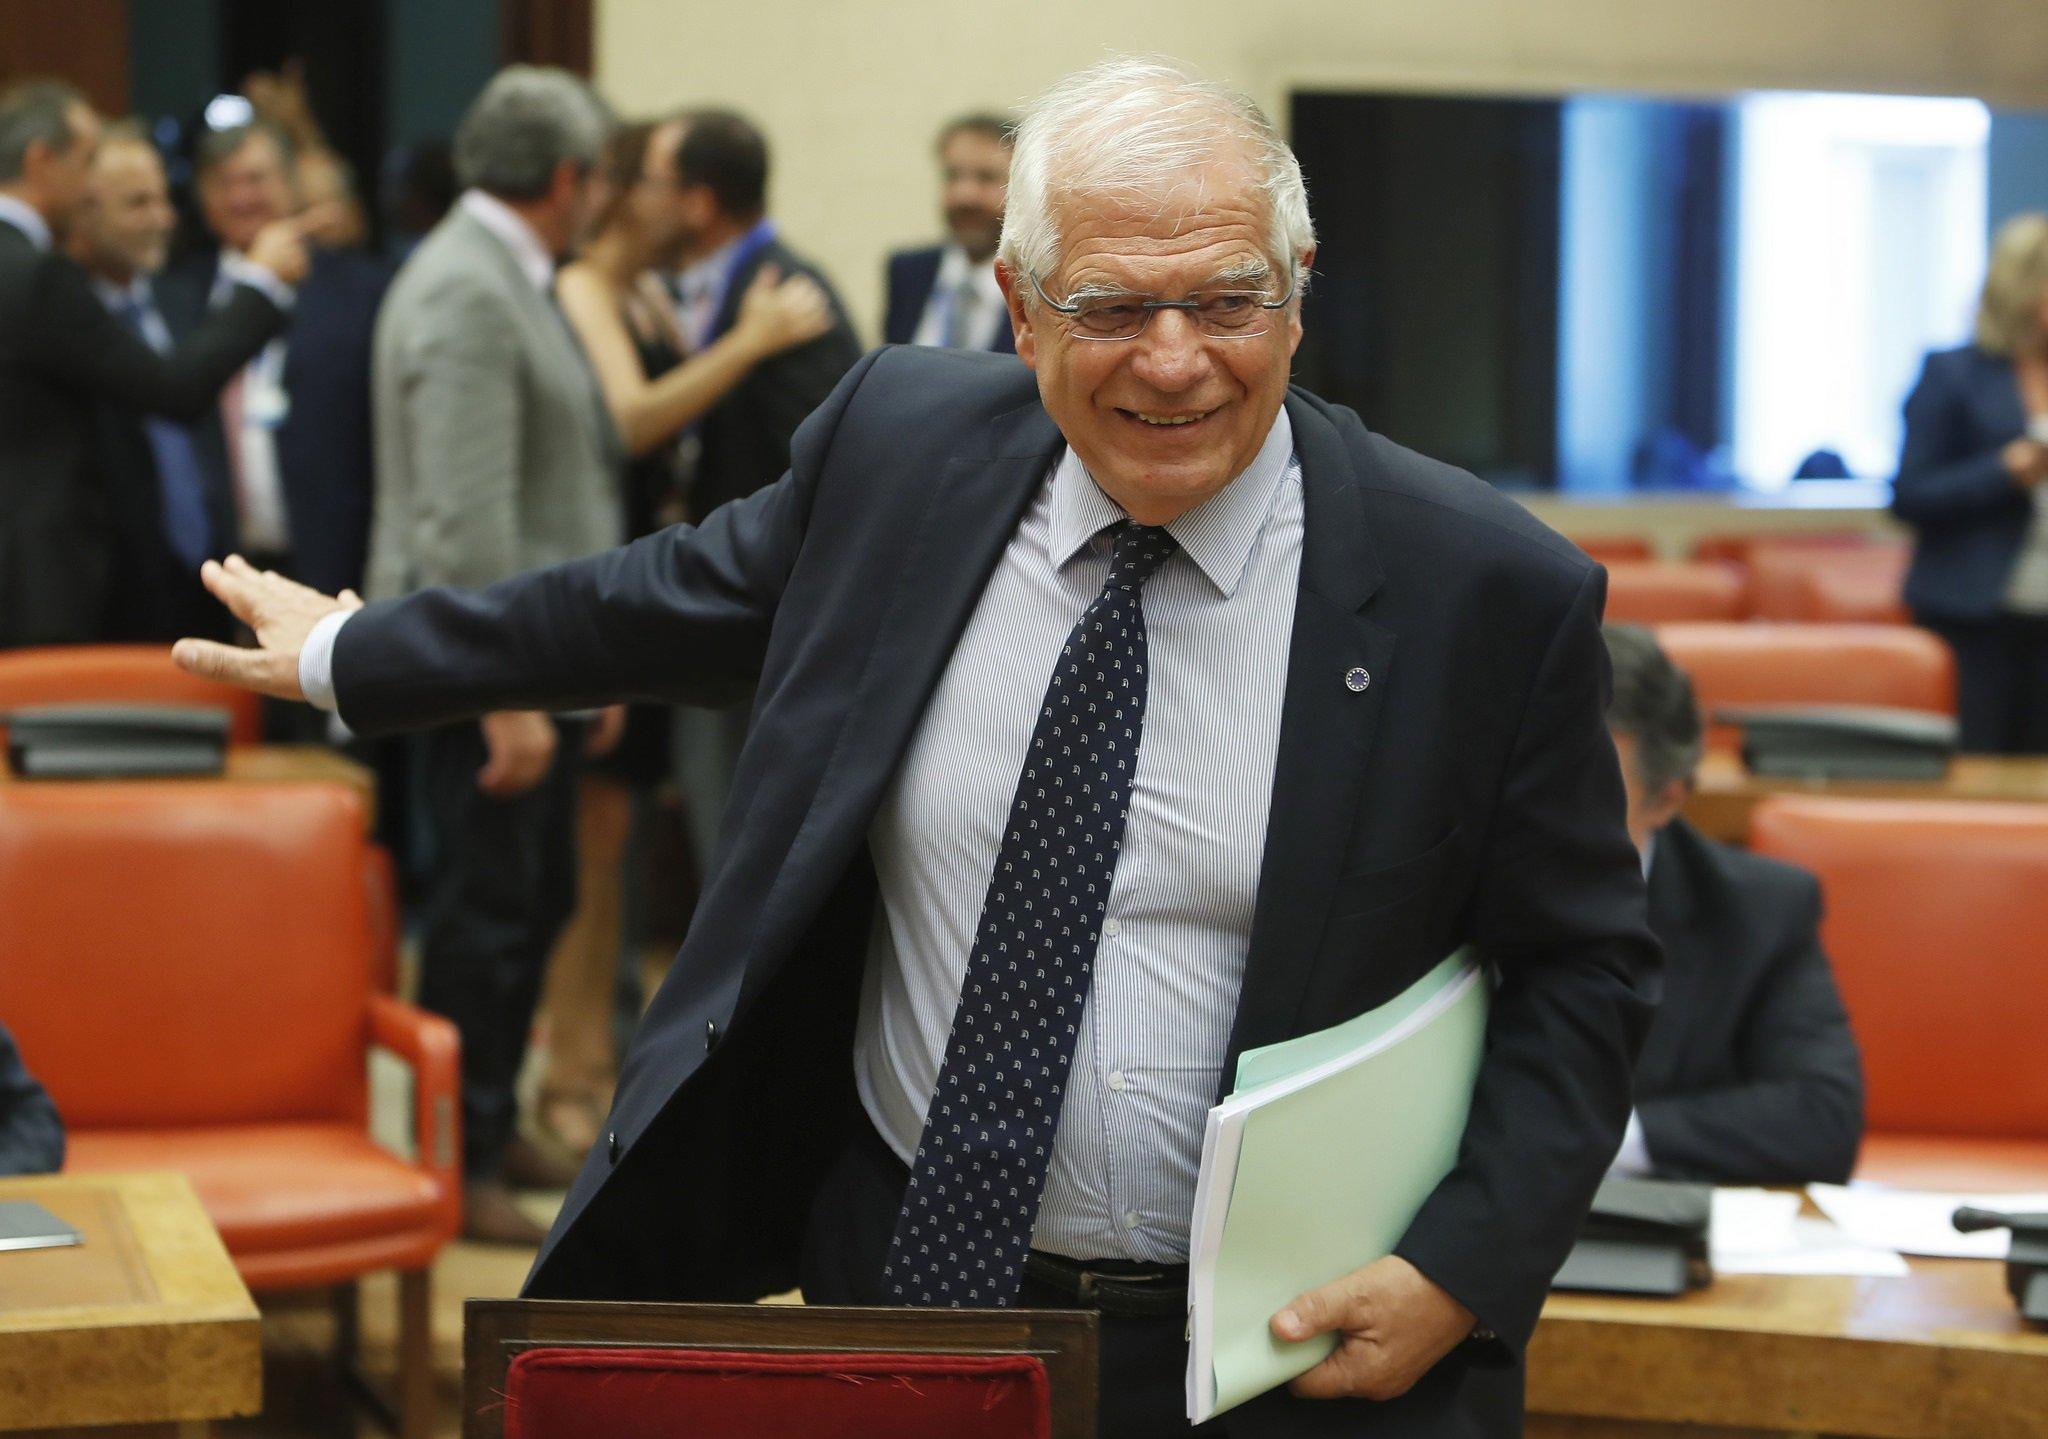 La multa de la CNMV a Borrell por Abengoa recorta un 42% su sueldo anual como ministro